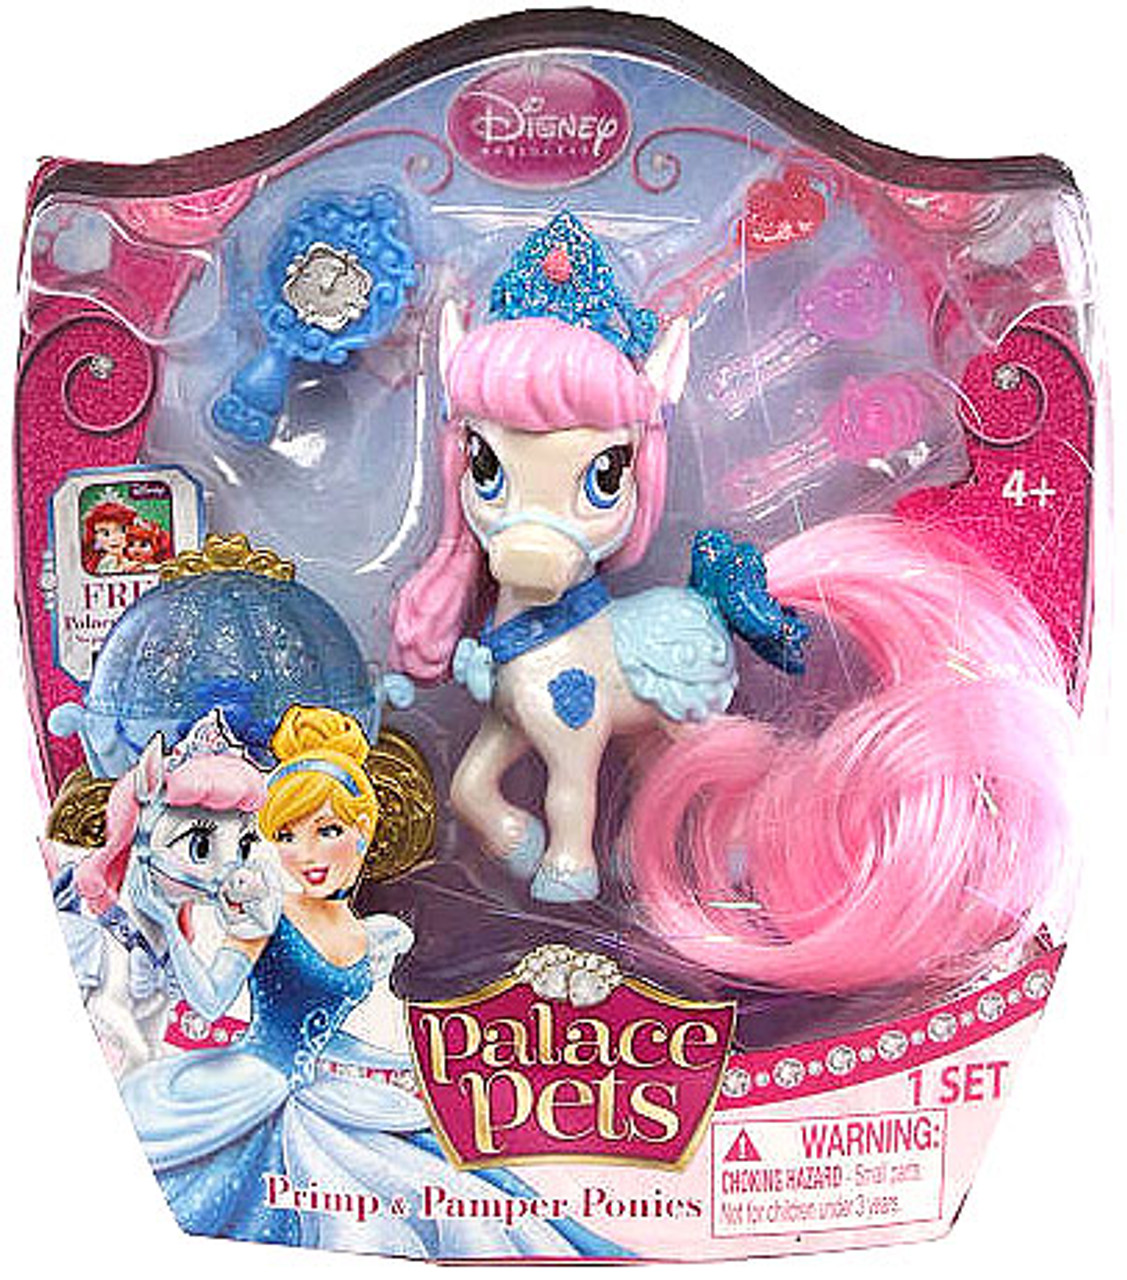 Palace Pets Bibbidy Figure Pack [Cinderella's Pony]